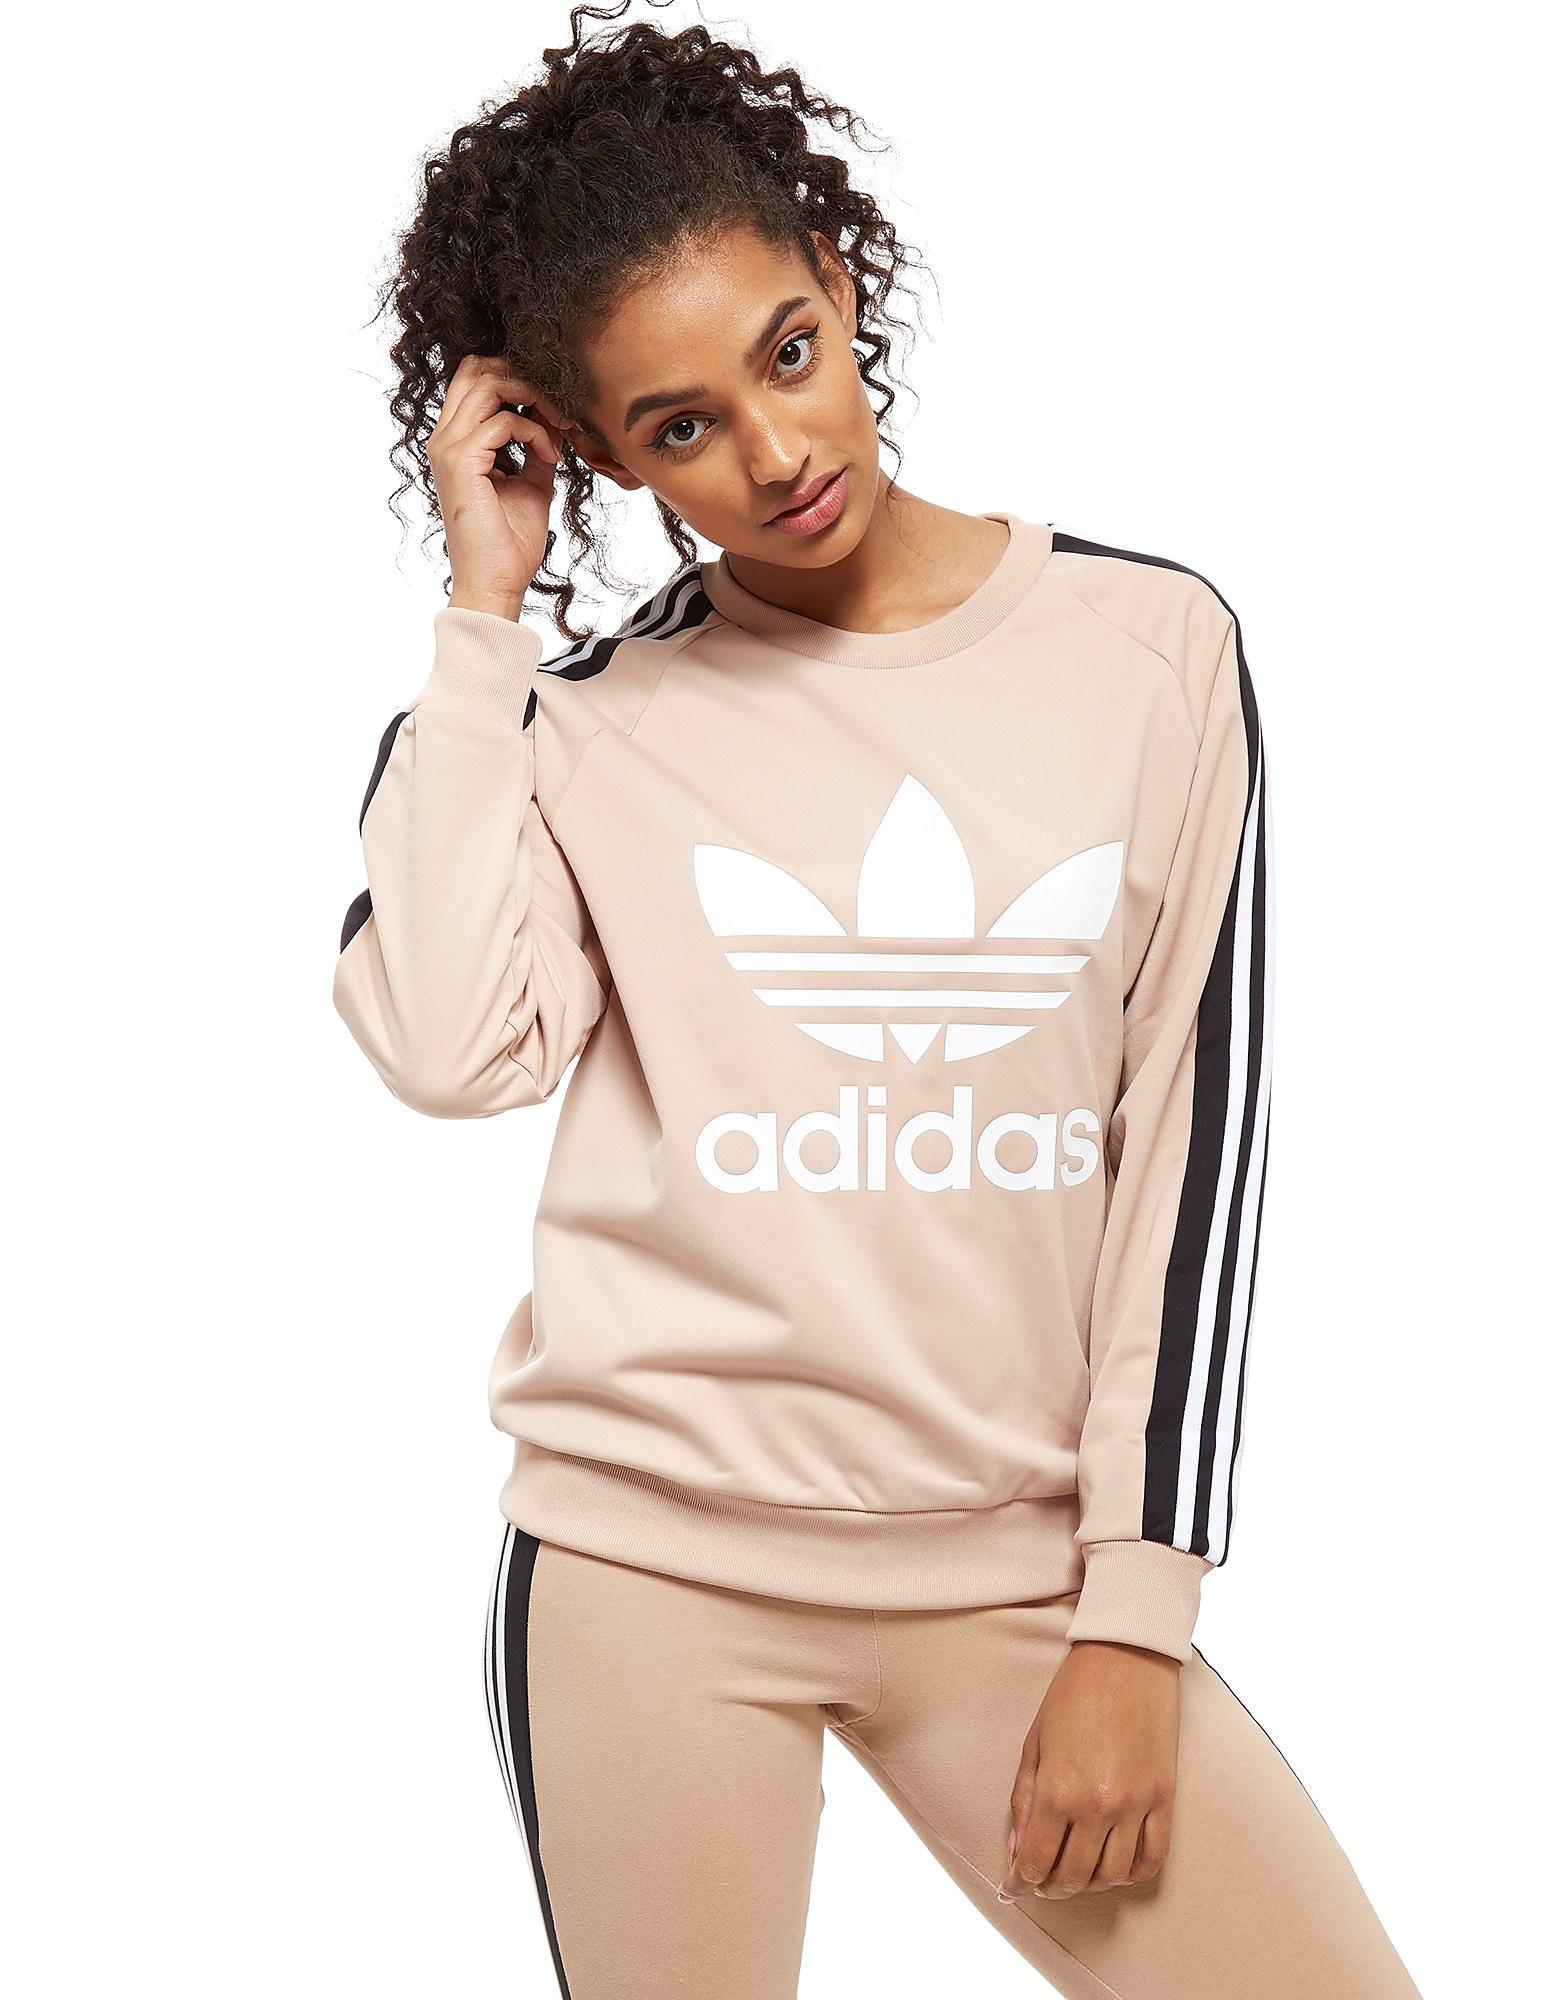 adidas Originals 3-Stripe Panel Crew Sweatshirt